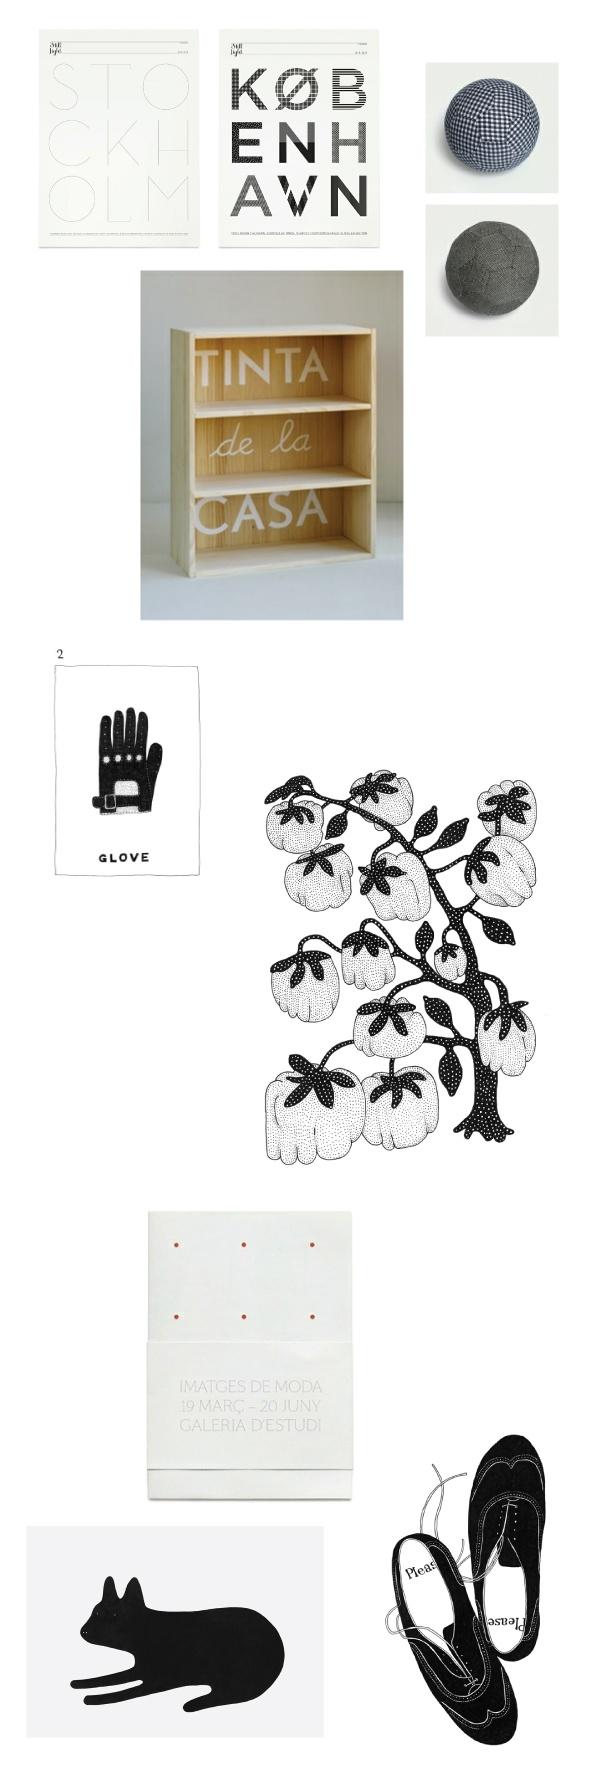 klas ernflo.: Shelf Ideas, Furniture Ideas